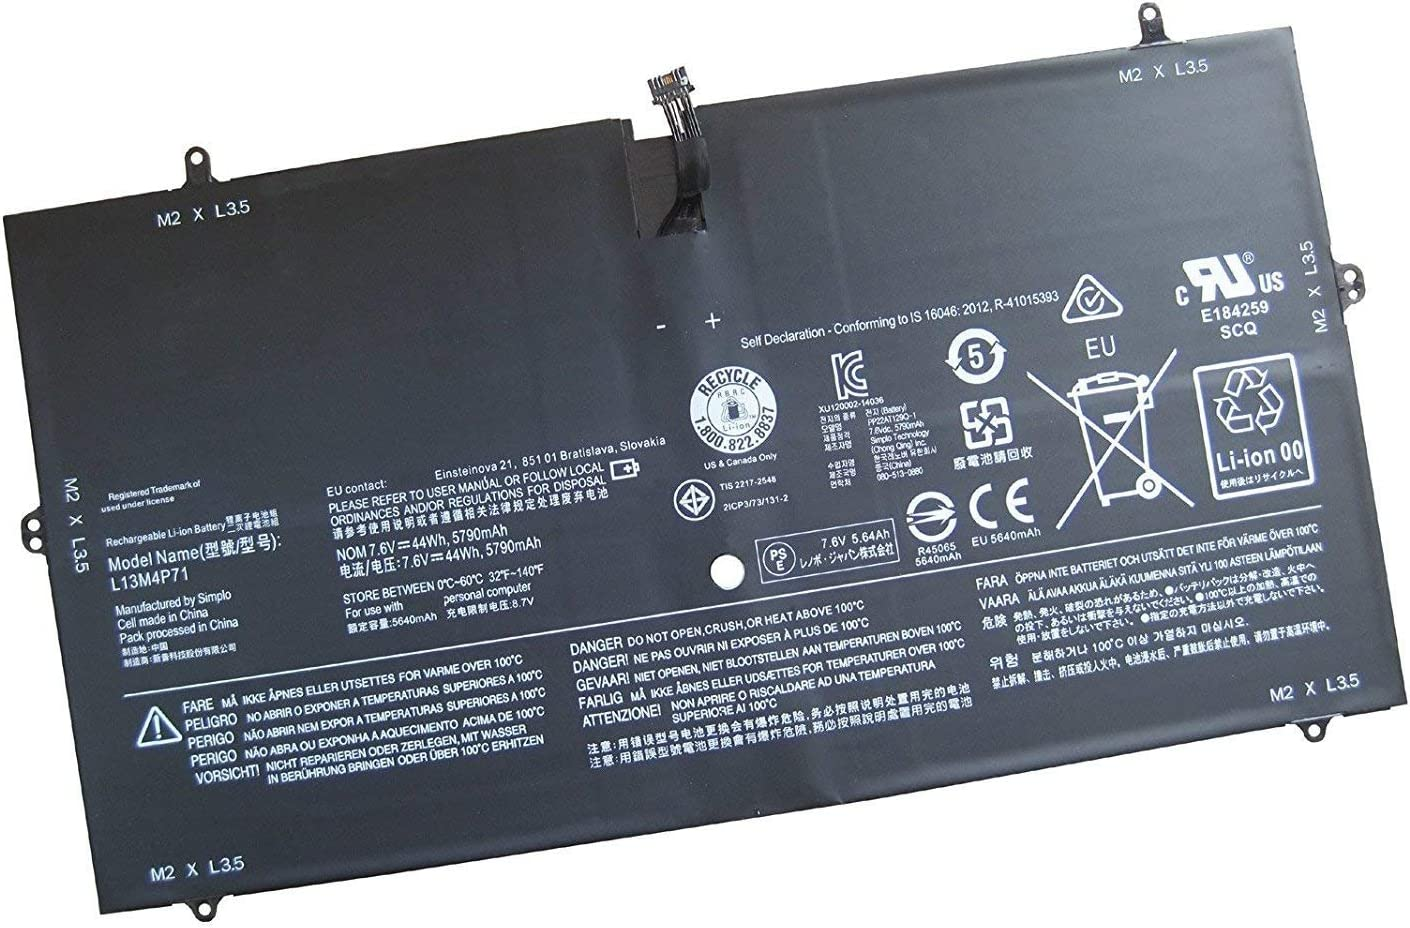 Ding L13M4P71 Replacement Battery Compatible with Lenovo L13M4P71 Yoga 3 Pro 1370 Series T440P (7.6V 44WH 5900mAh)